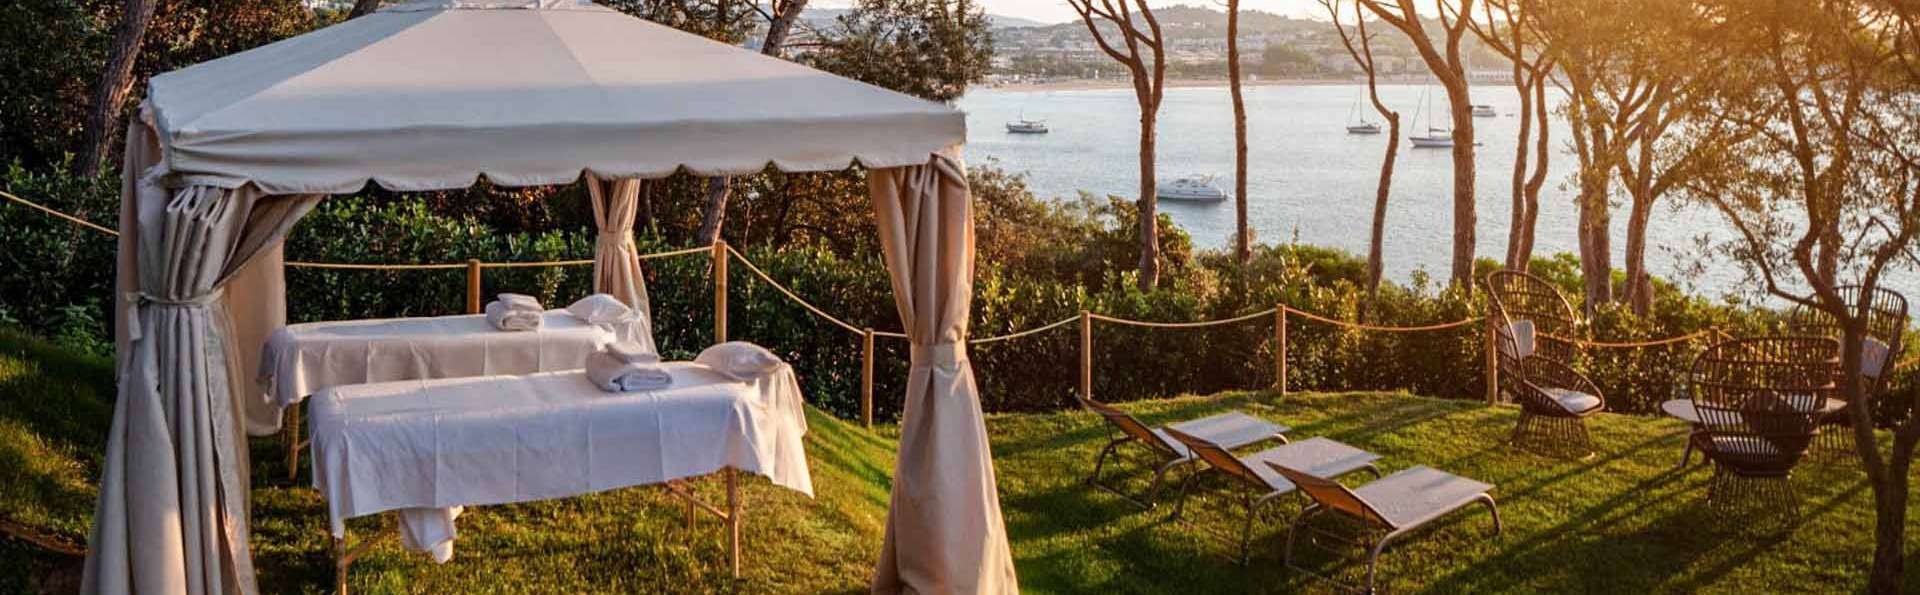 Alàbriga Hotel Spa & HomeSuites - EDIT_Wellbeing_01.jpg